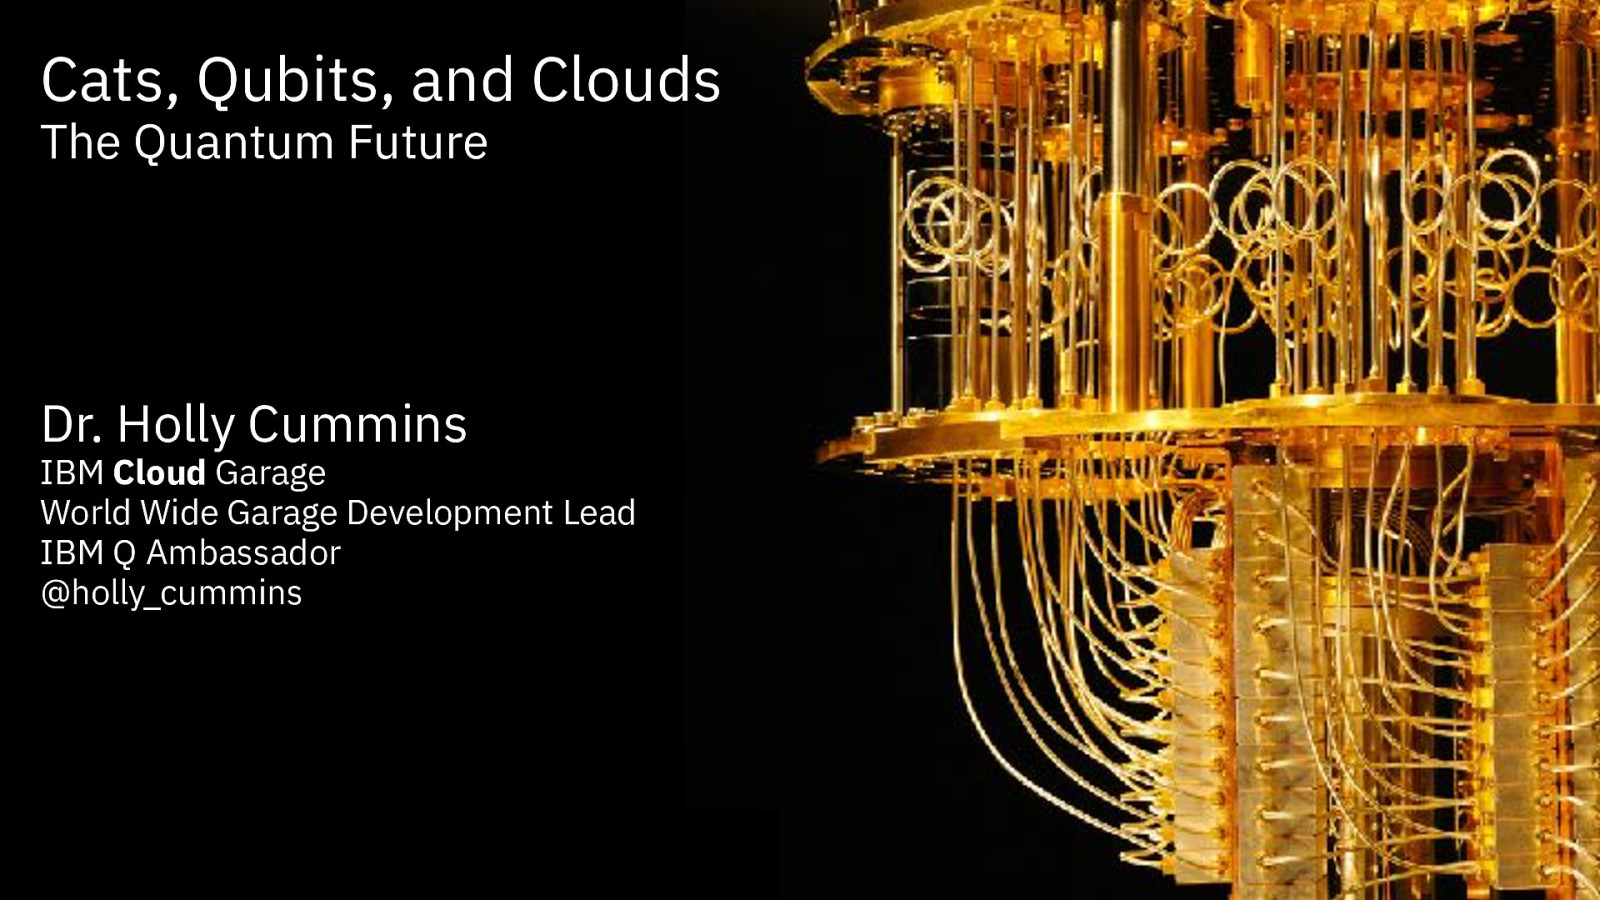 Cats, Qubits, and Clouds - The Quantum Future